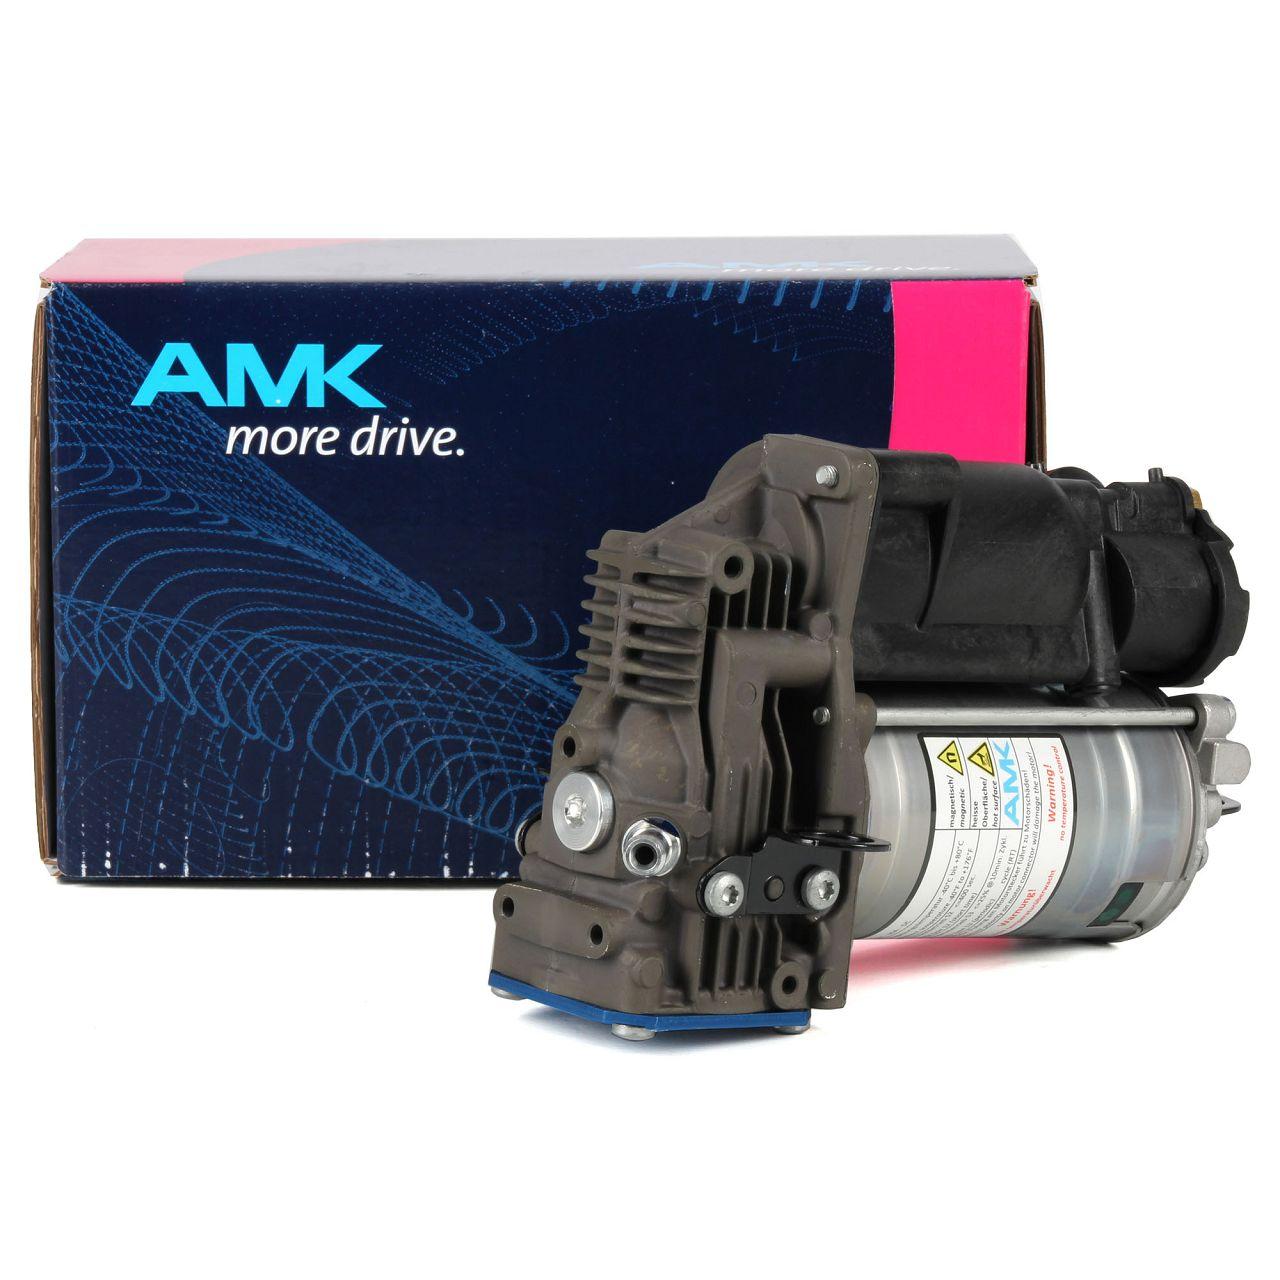 AMK A1901-1 Kompressor Luftfederung MERCEDES M-Klasse W166 GL-Klasse X166 1663200104